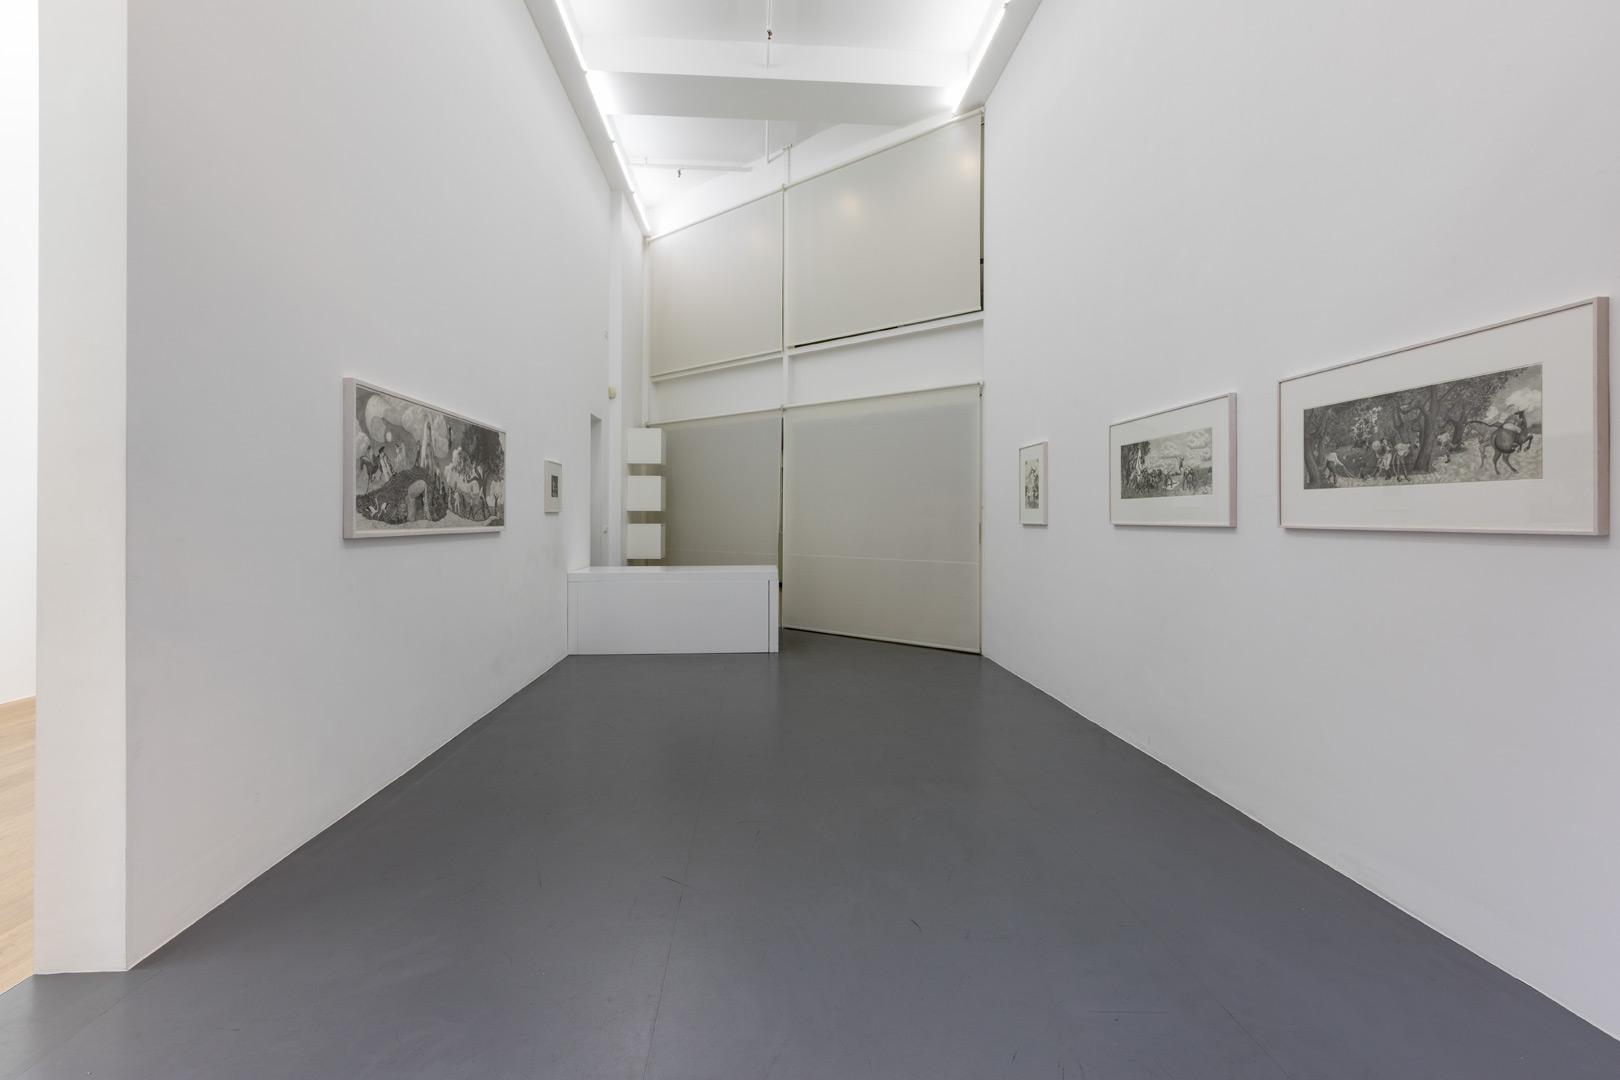 Emmanuel Tête.  Jardingue  Exhibition view. Room 1